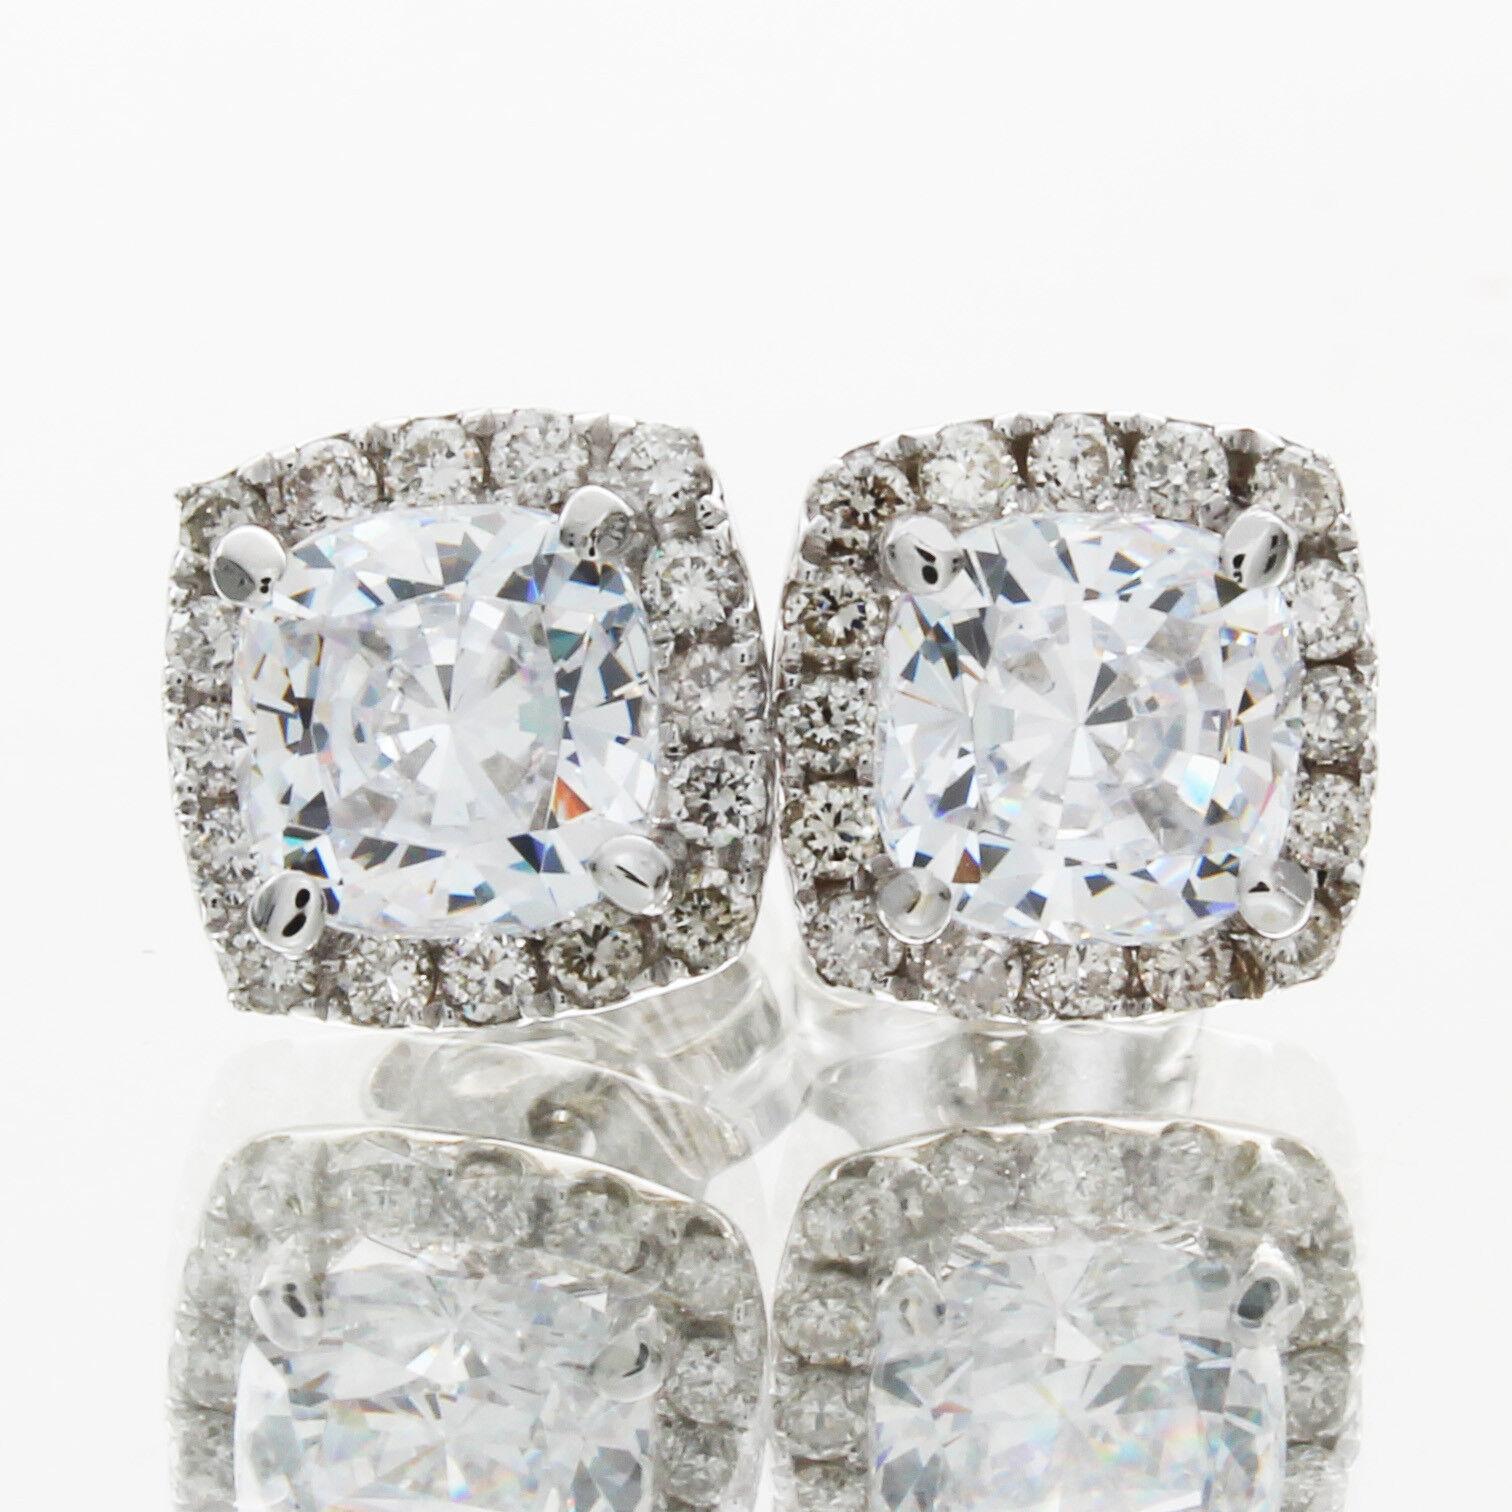 18k White gold Cushion Cut Diamond GIA Certified 2.50 Carat Diamond Earring Set